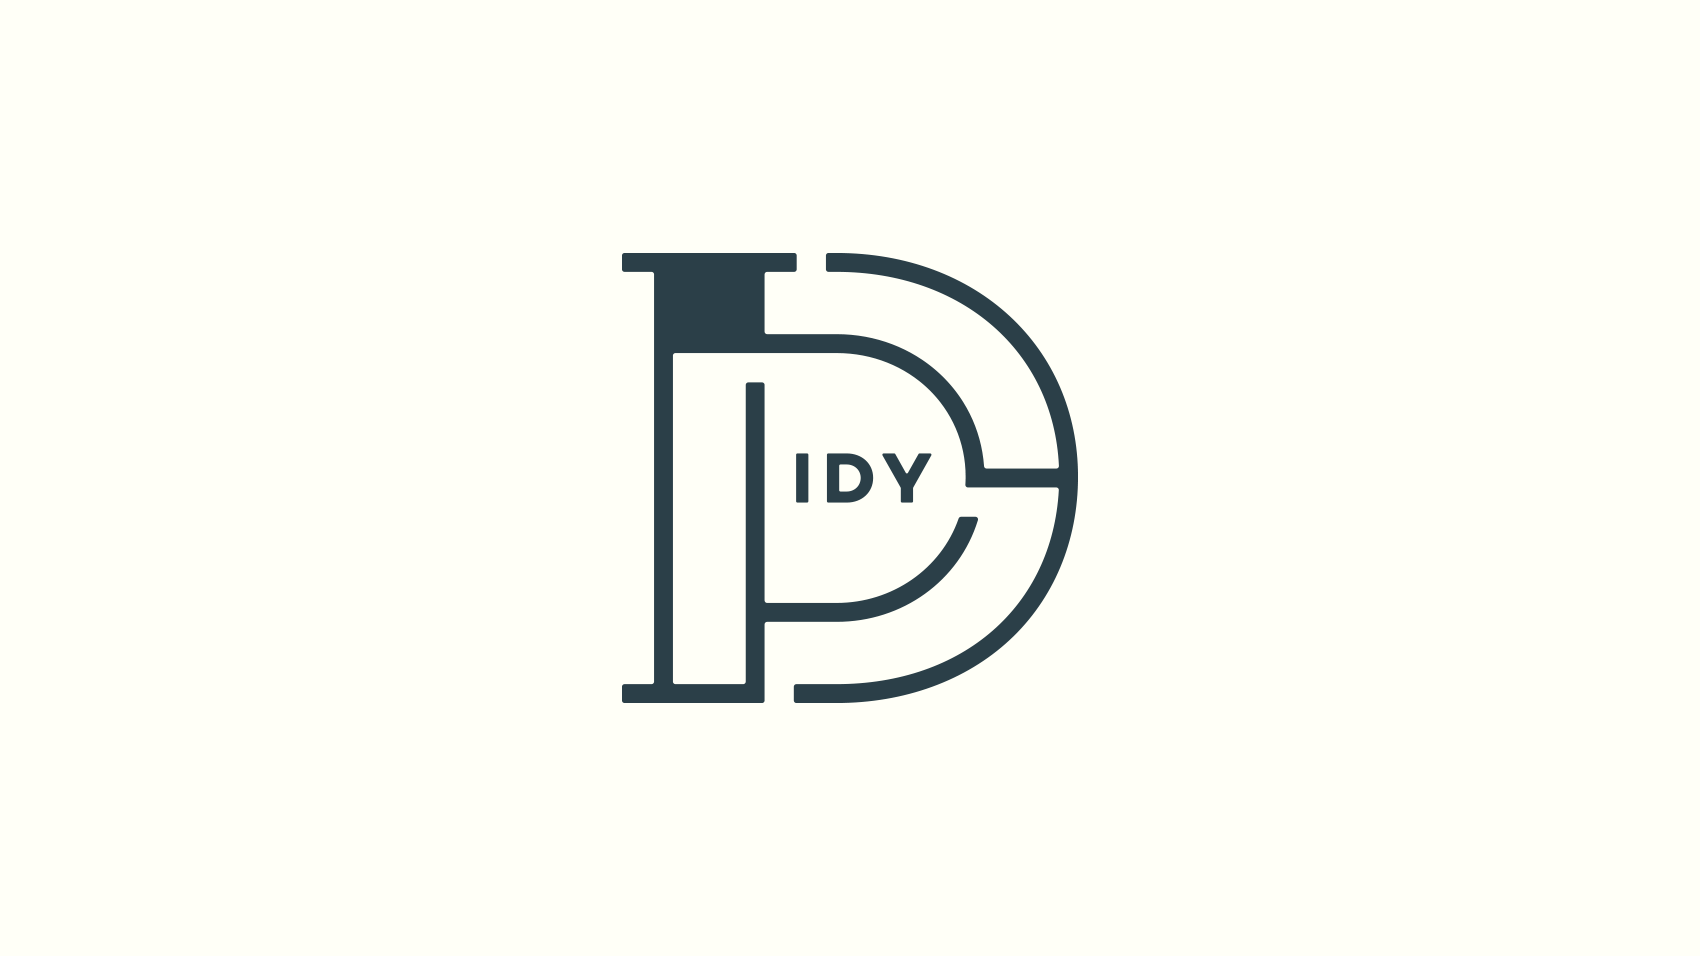 SNSを意識してロゴの特徴を際立たせる「IDY(アイディ)」のアイコンデザイン